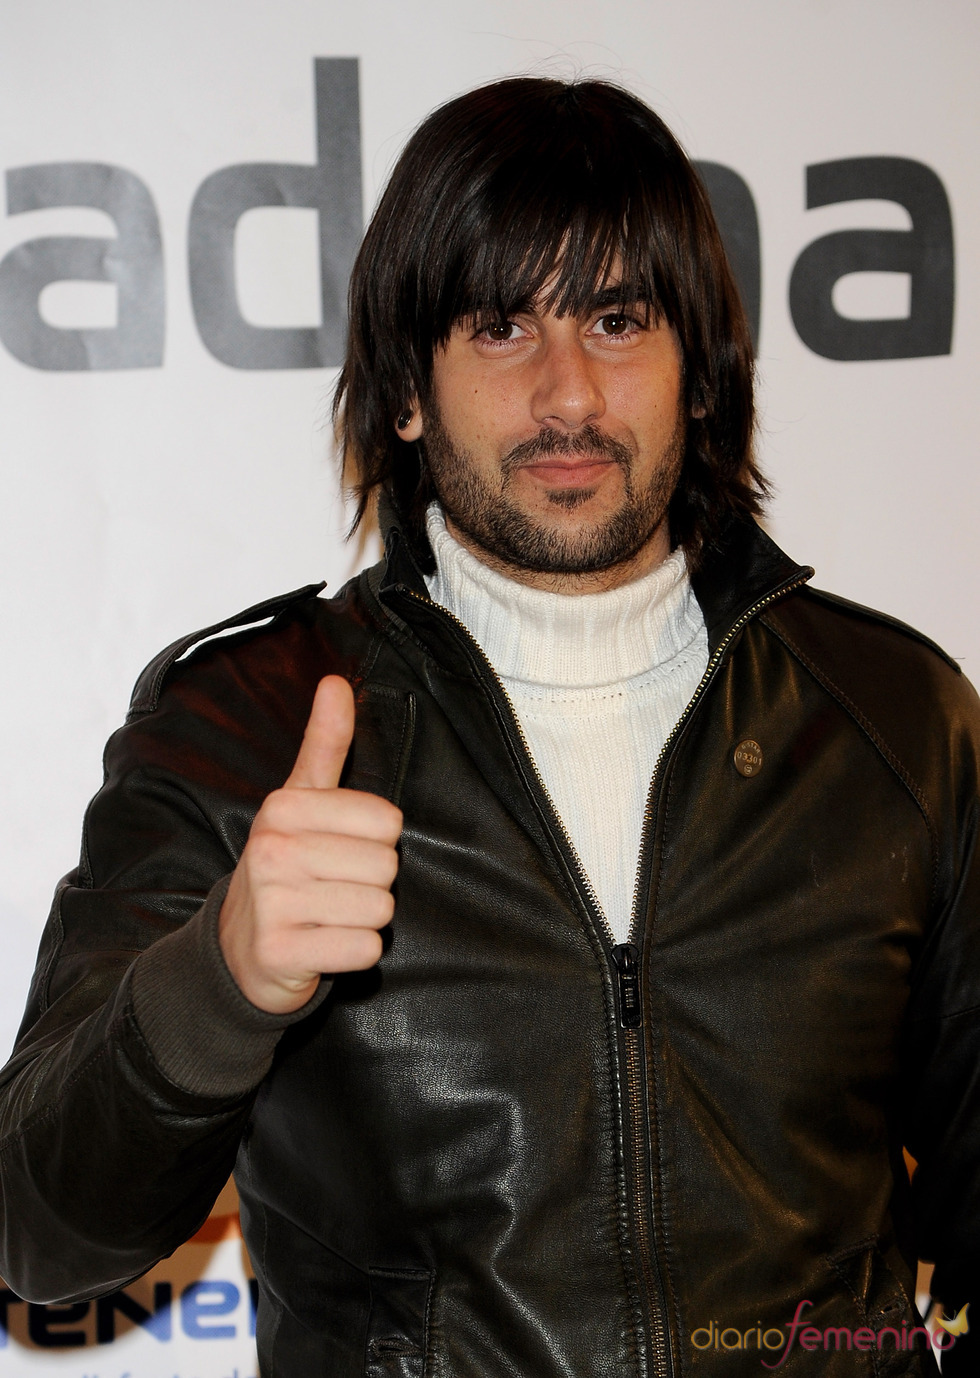 El cantante asturiano Melendi